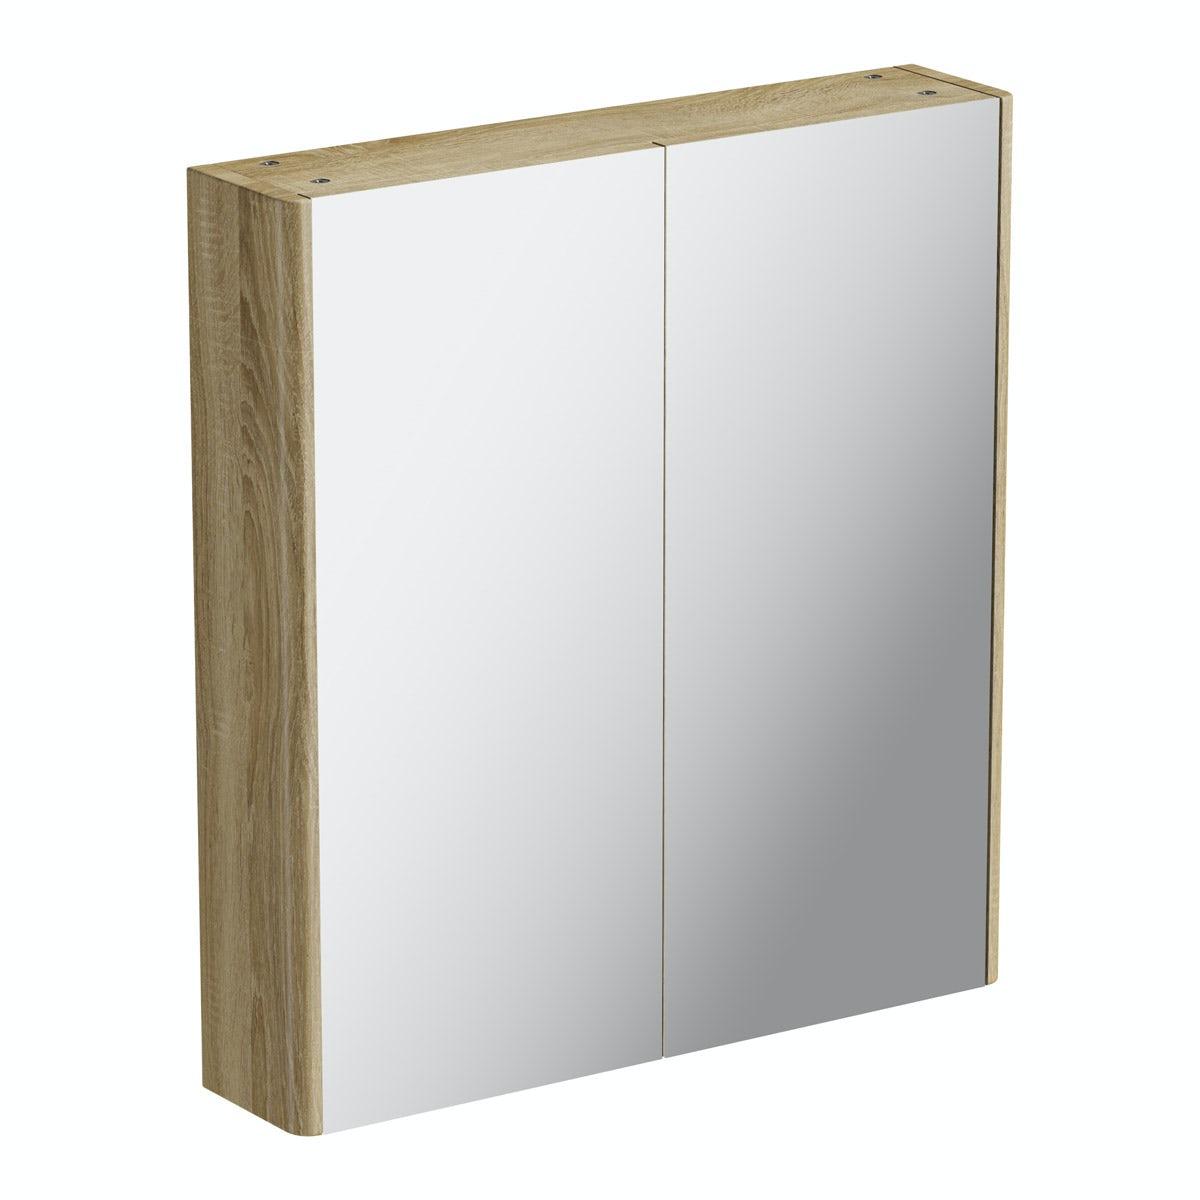 Mode Sherwood oak curved mirror cabinet 600mm